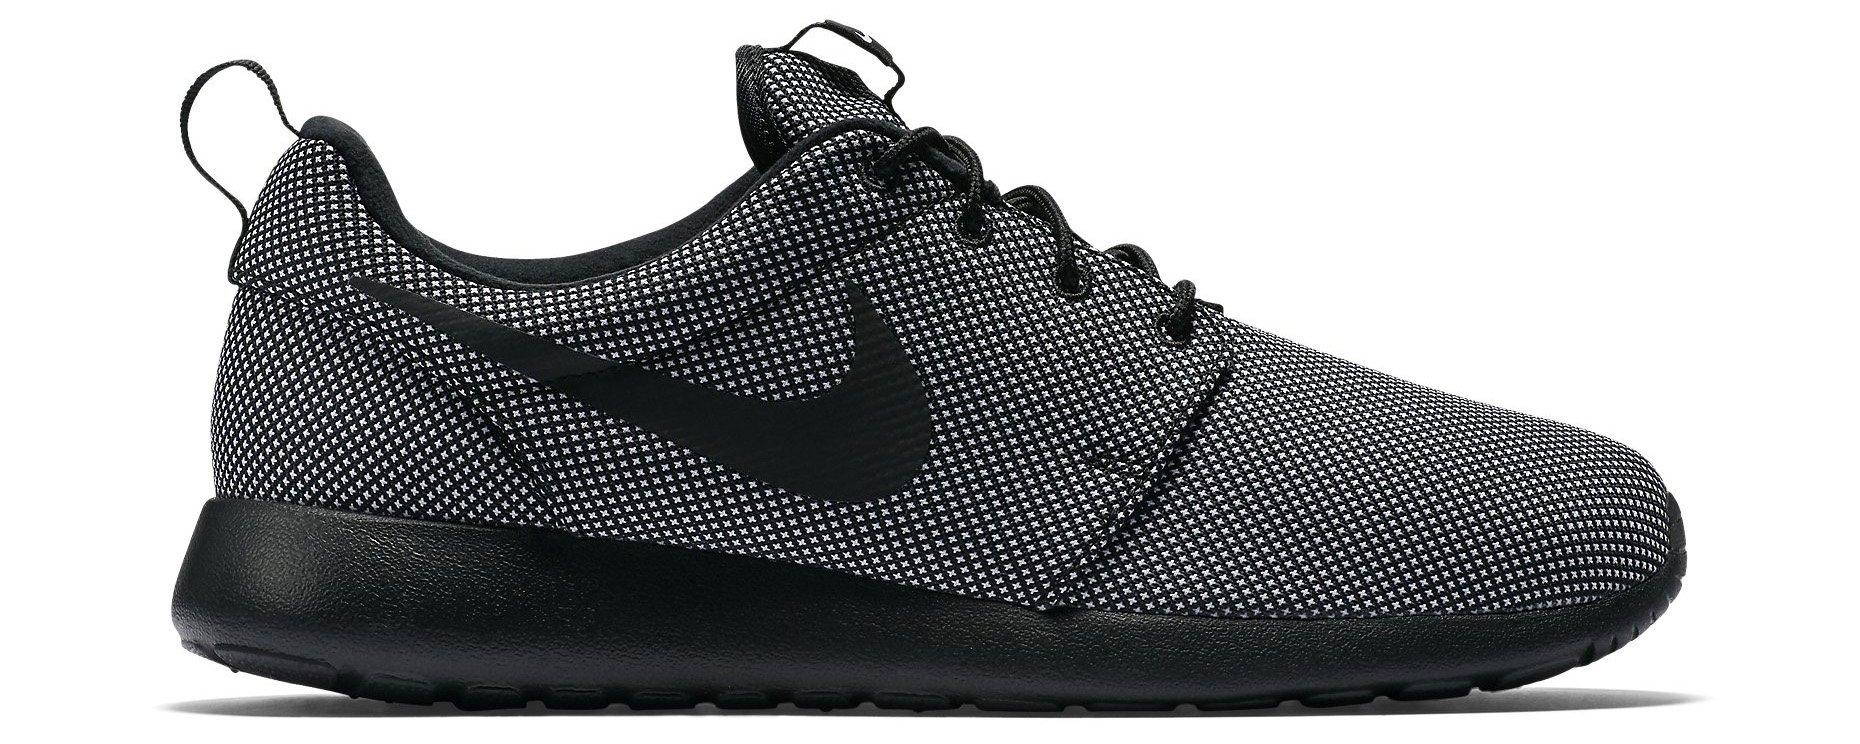 Boty Nike Roshe One Premium